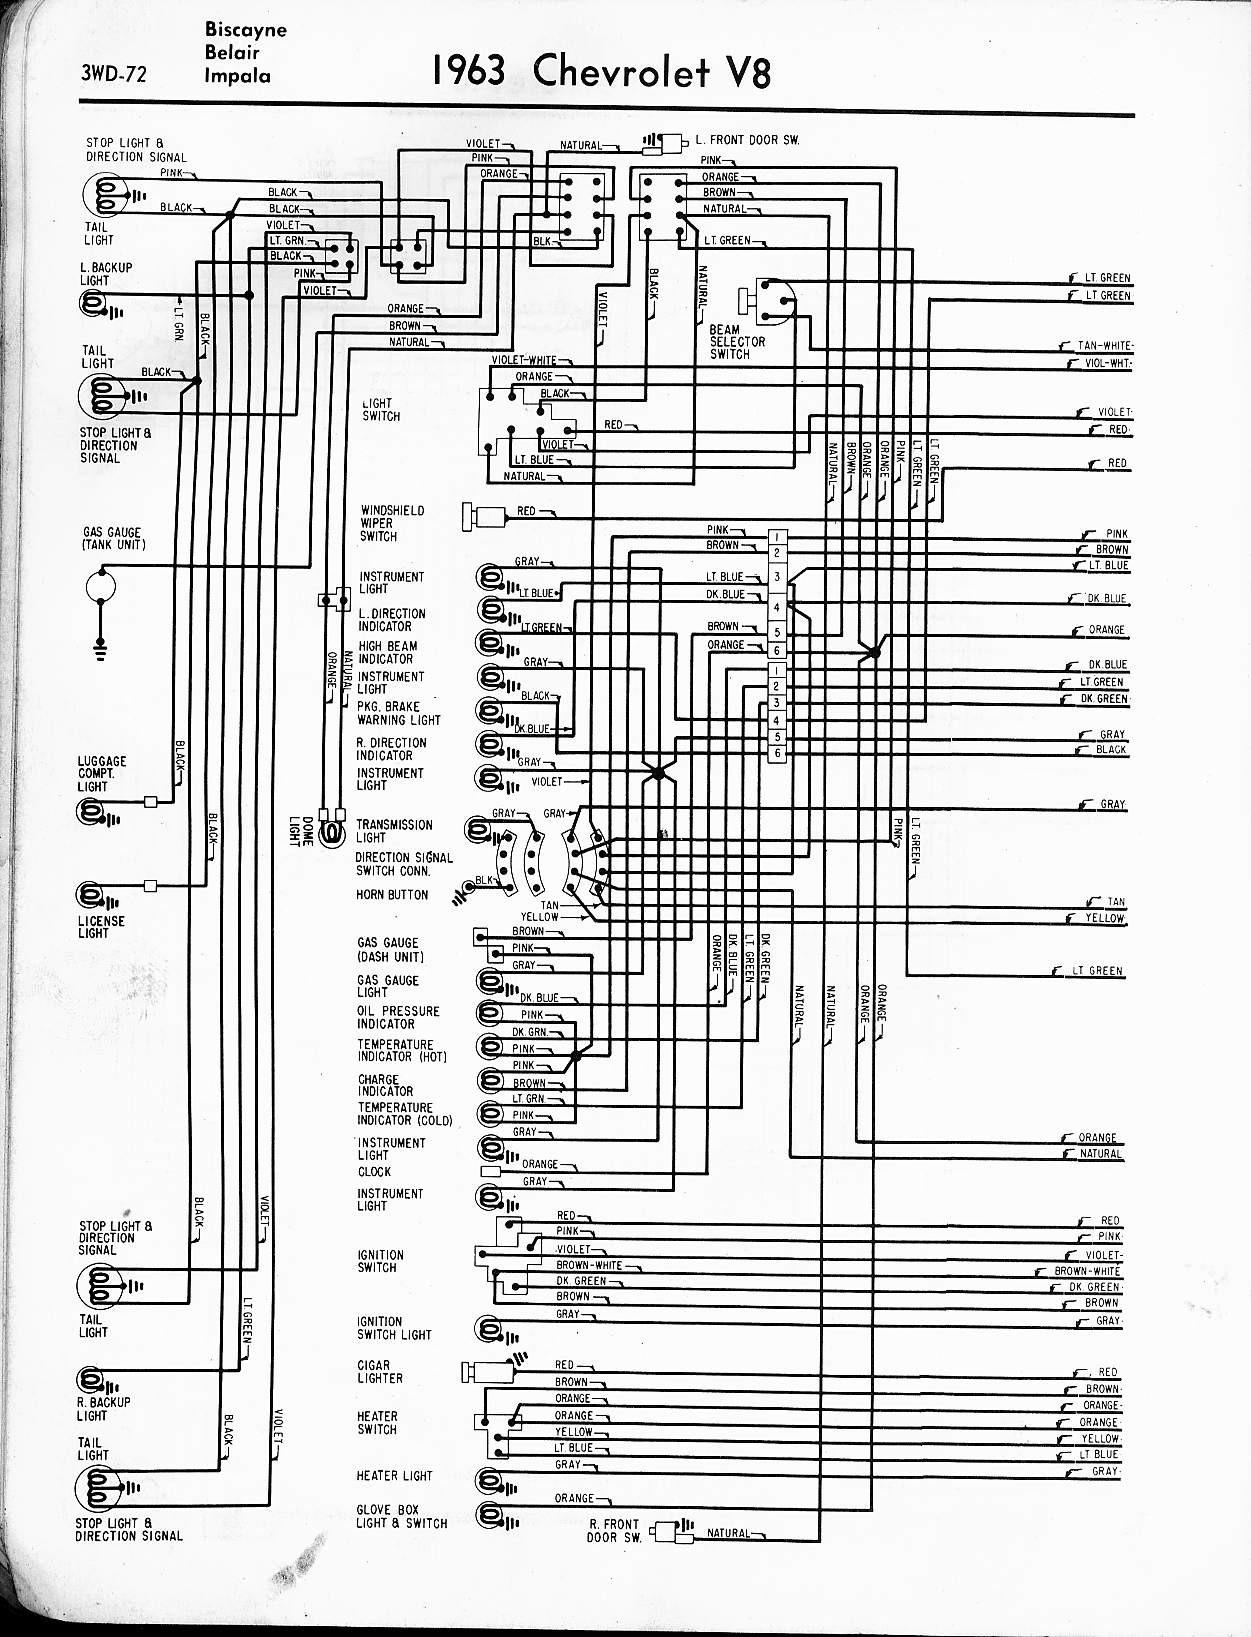 v8 engine diagram basic get image about wiring diagram